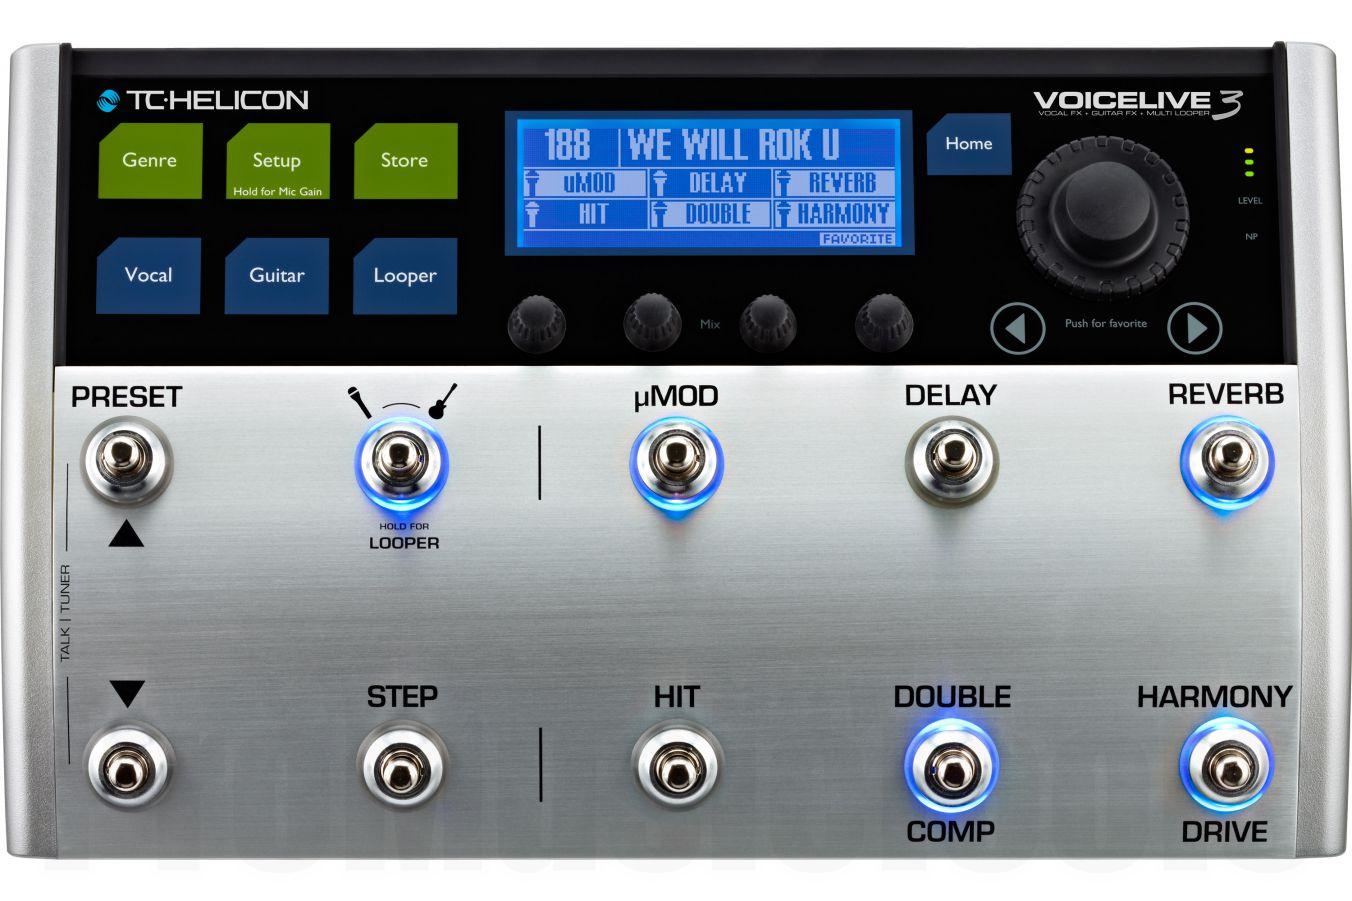 TC Helicon VoiceLive 3 - demo